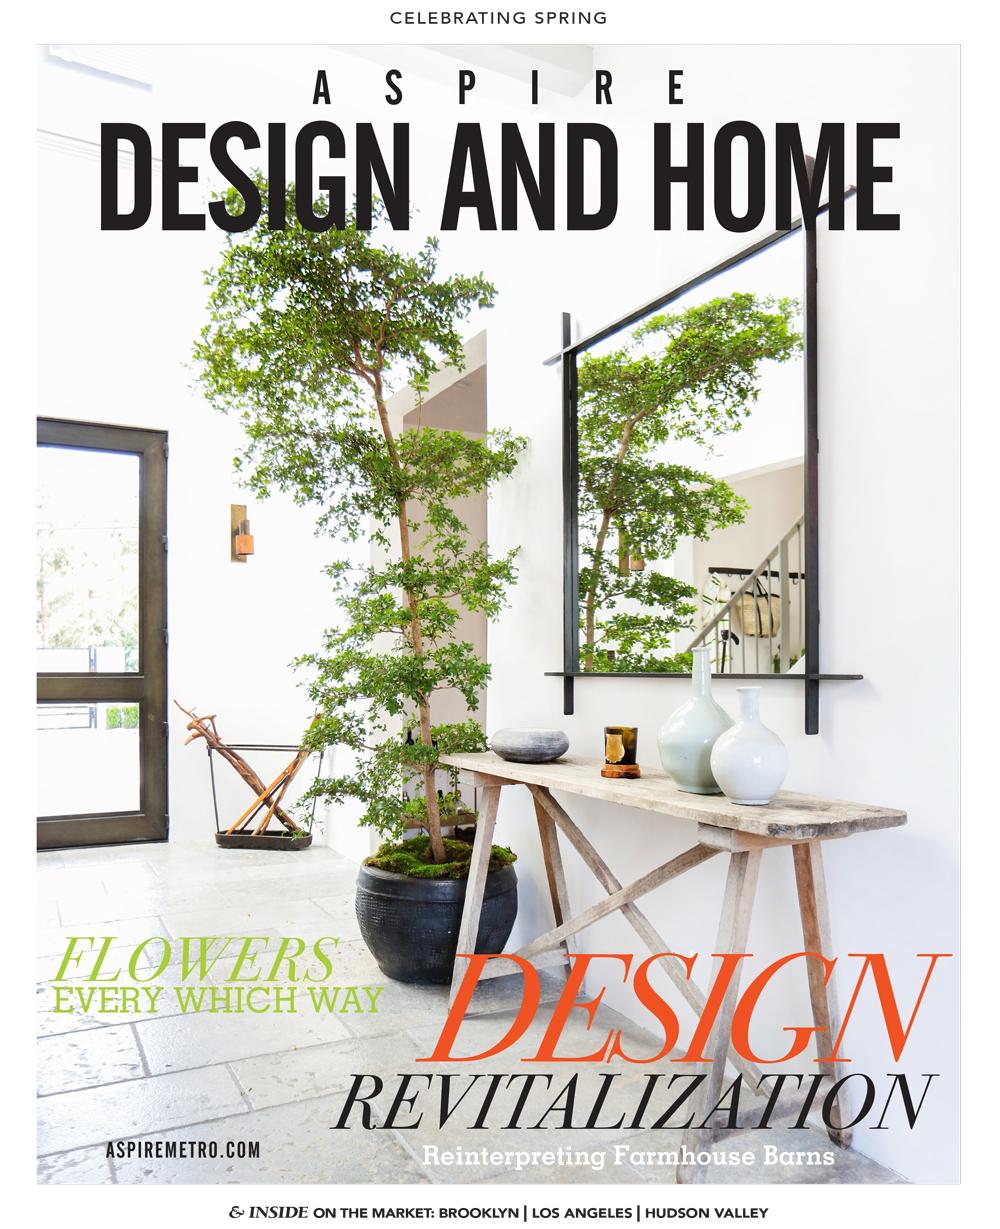 Naya-Traveler_Aspire-Design-and-Home-Magazine_Spring-2018.png